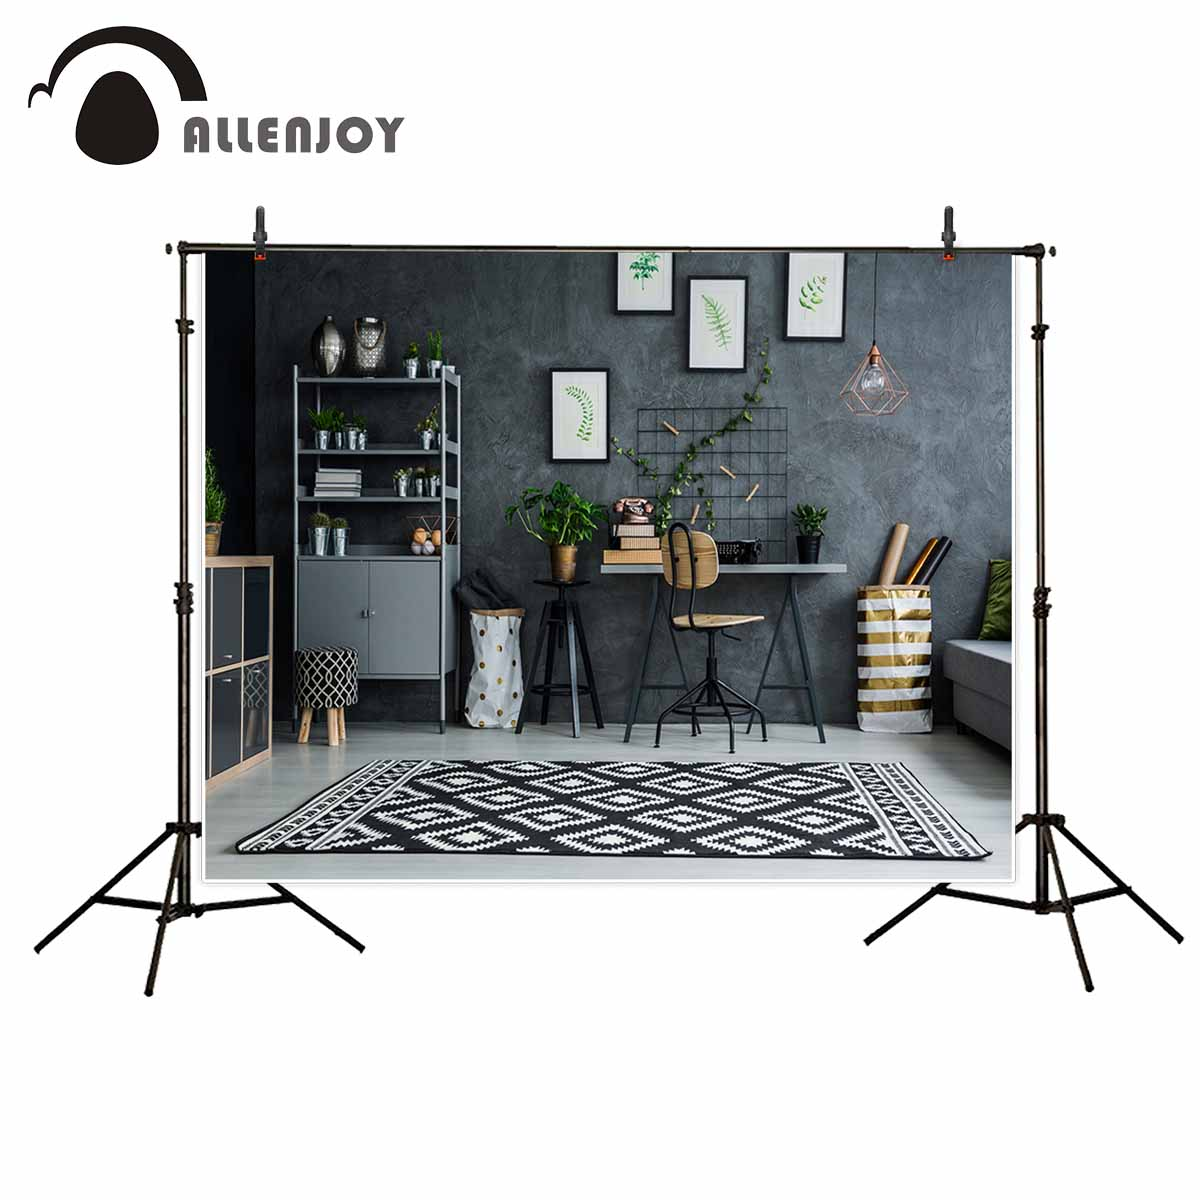 Allenjoy photography backdrops Indoor modern room carpet chair Gray wall plants photo backdrop fond studio photo oxygen bar chair gray